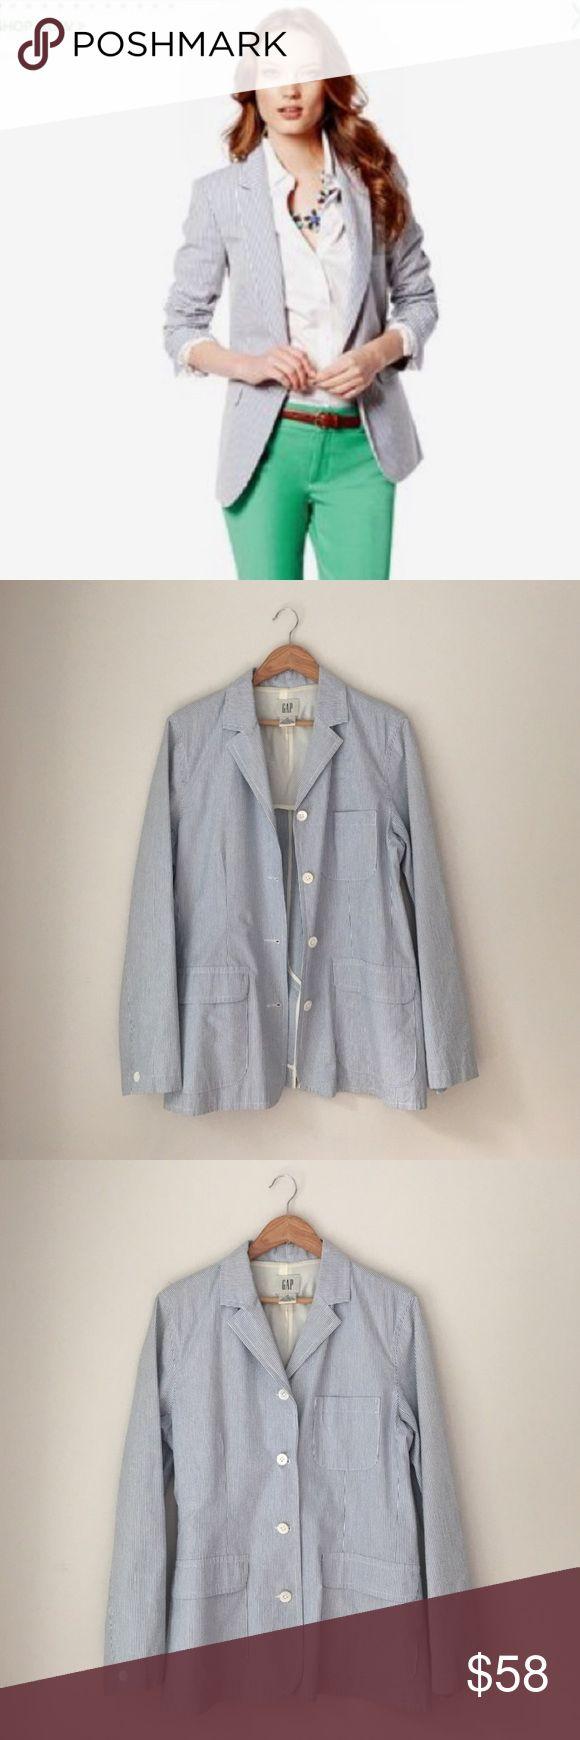 GAP Blue Seersucker Blazer Size 14 Classic seersucker blazer in blue by the GAP. 100% cotton. (Model is wearing slightly different style). Size 14. Excellent condition. GAP Jackets & Coats Blazers